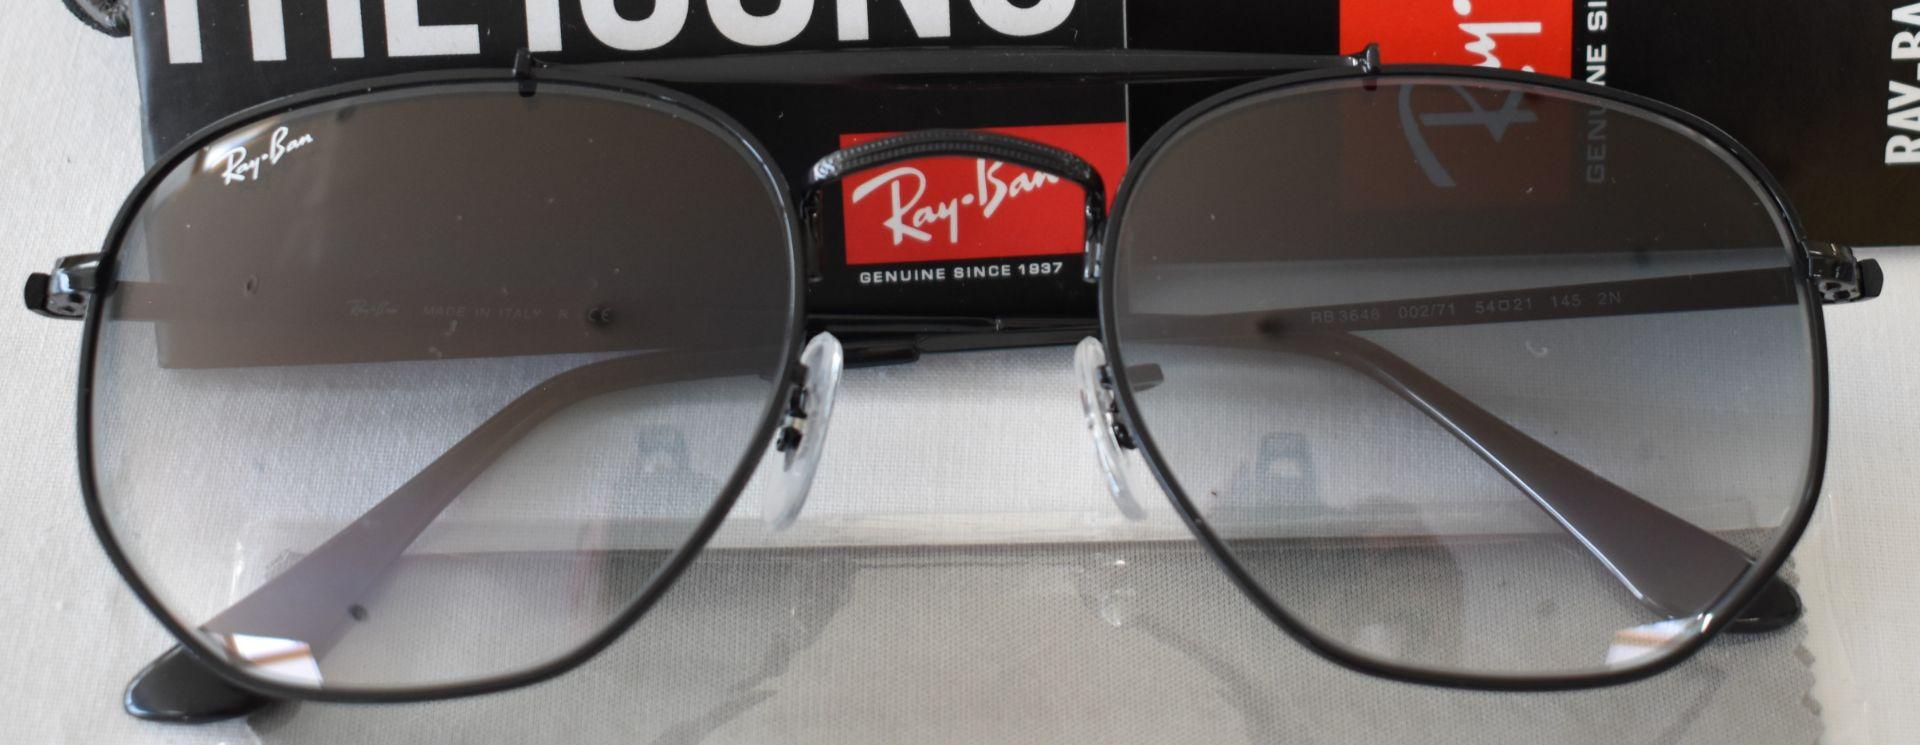 Ray Ban Sunglasses ORB3648 002/71 *2N - Image 2 of 3